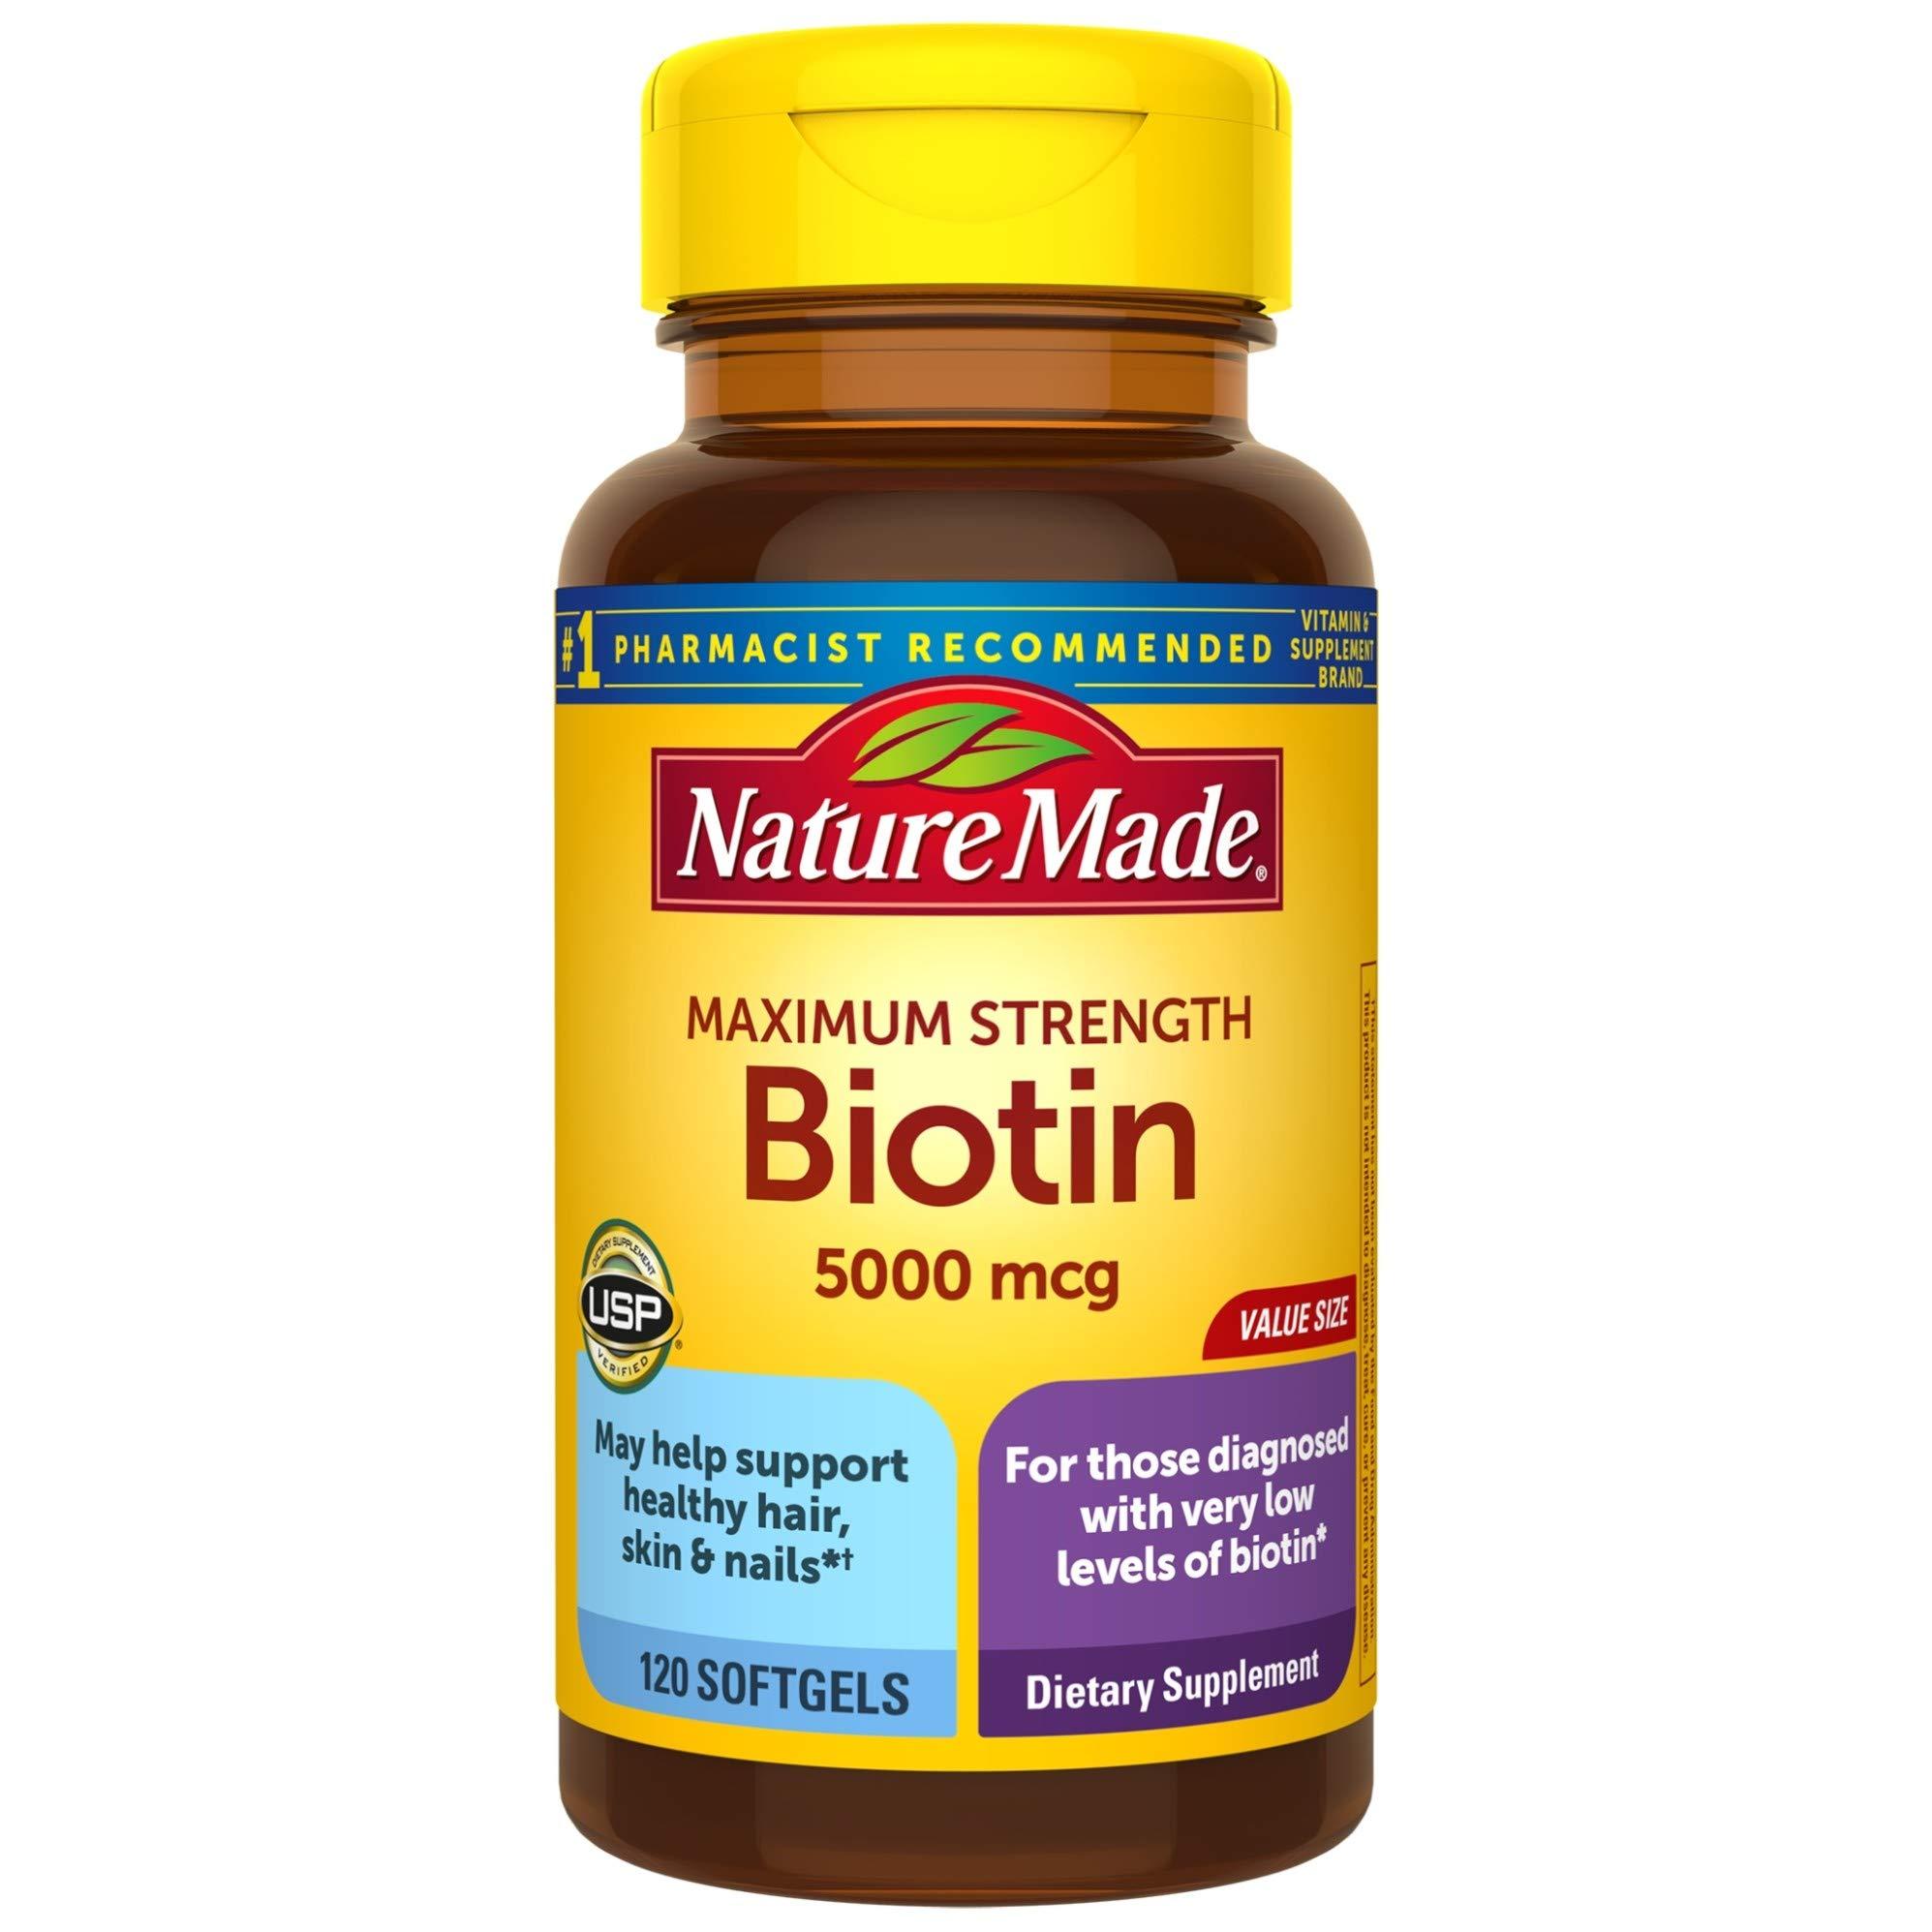 Nature Made Maximum Strength Biotin 5000 mcg Softgels, 120 Count Value Size